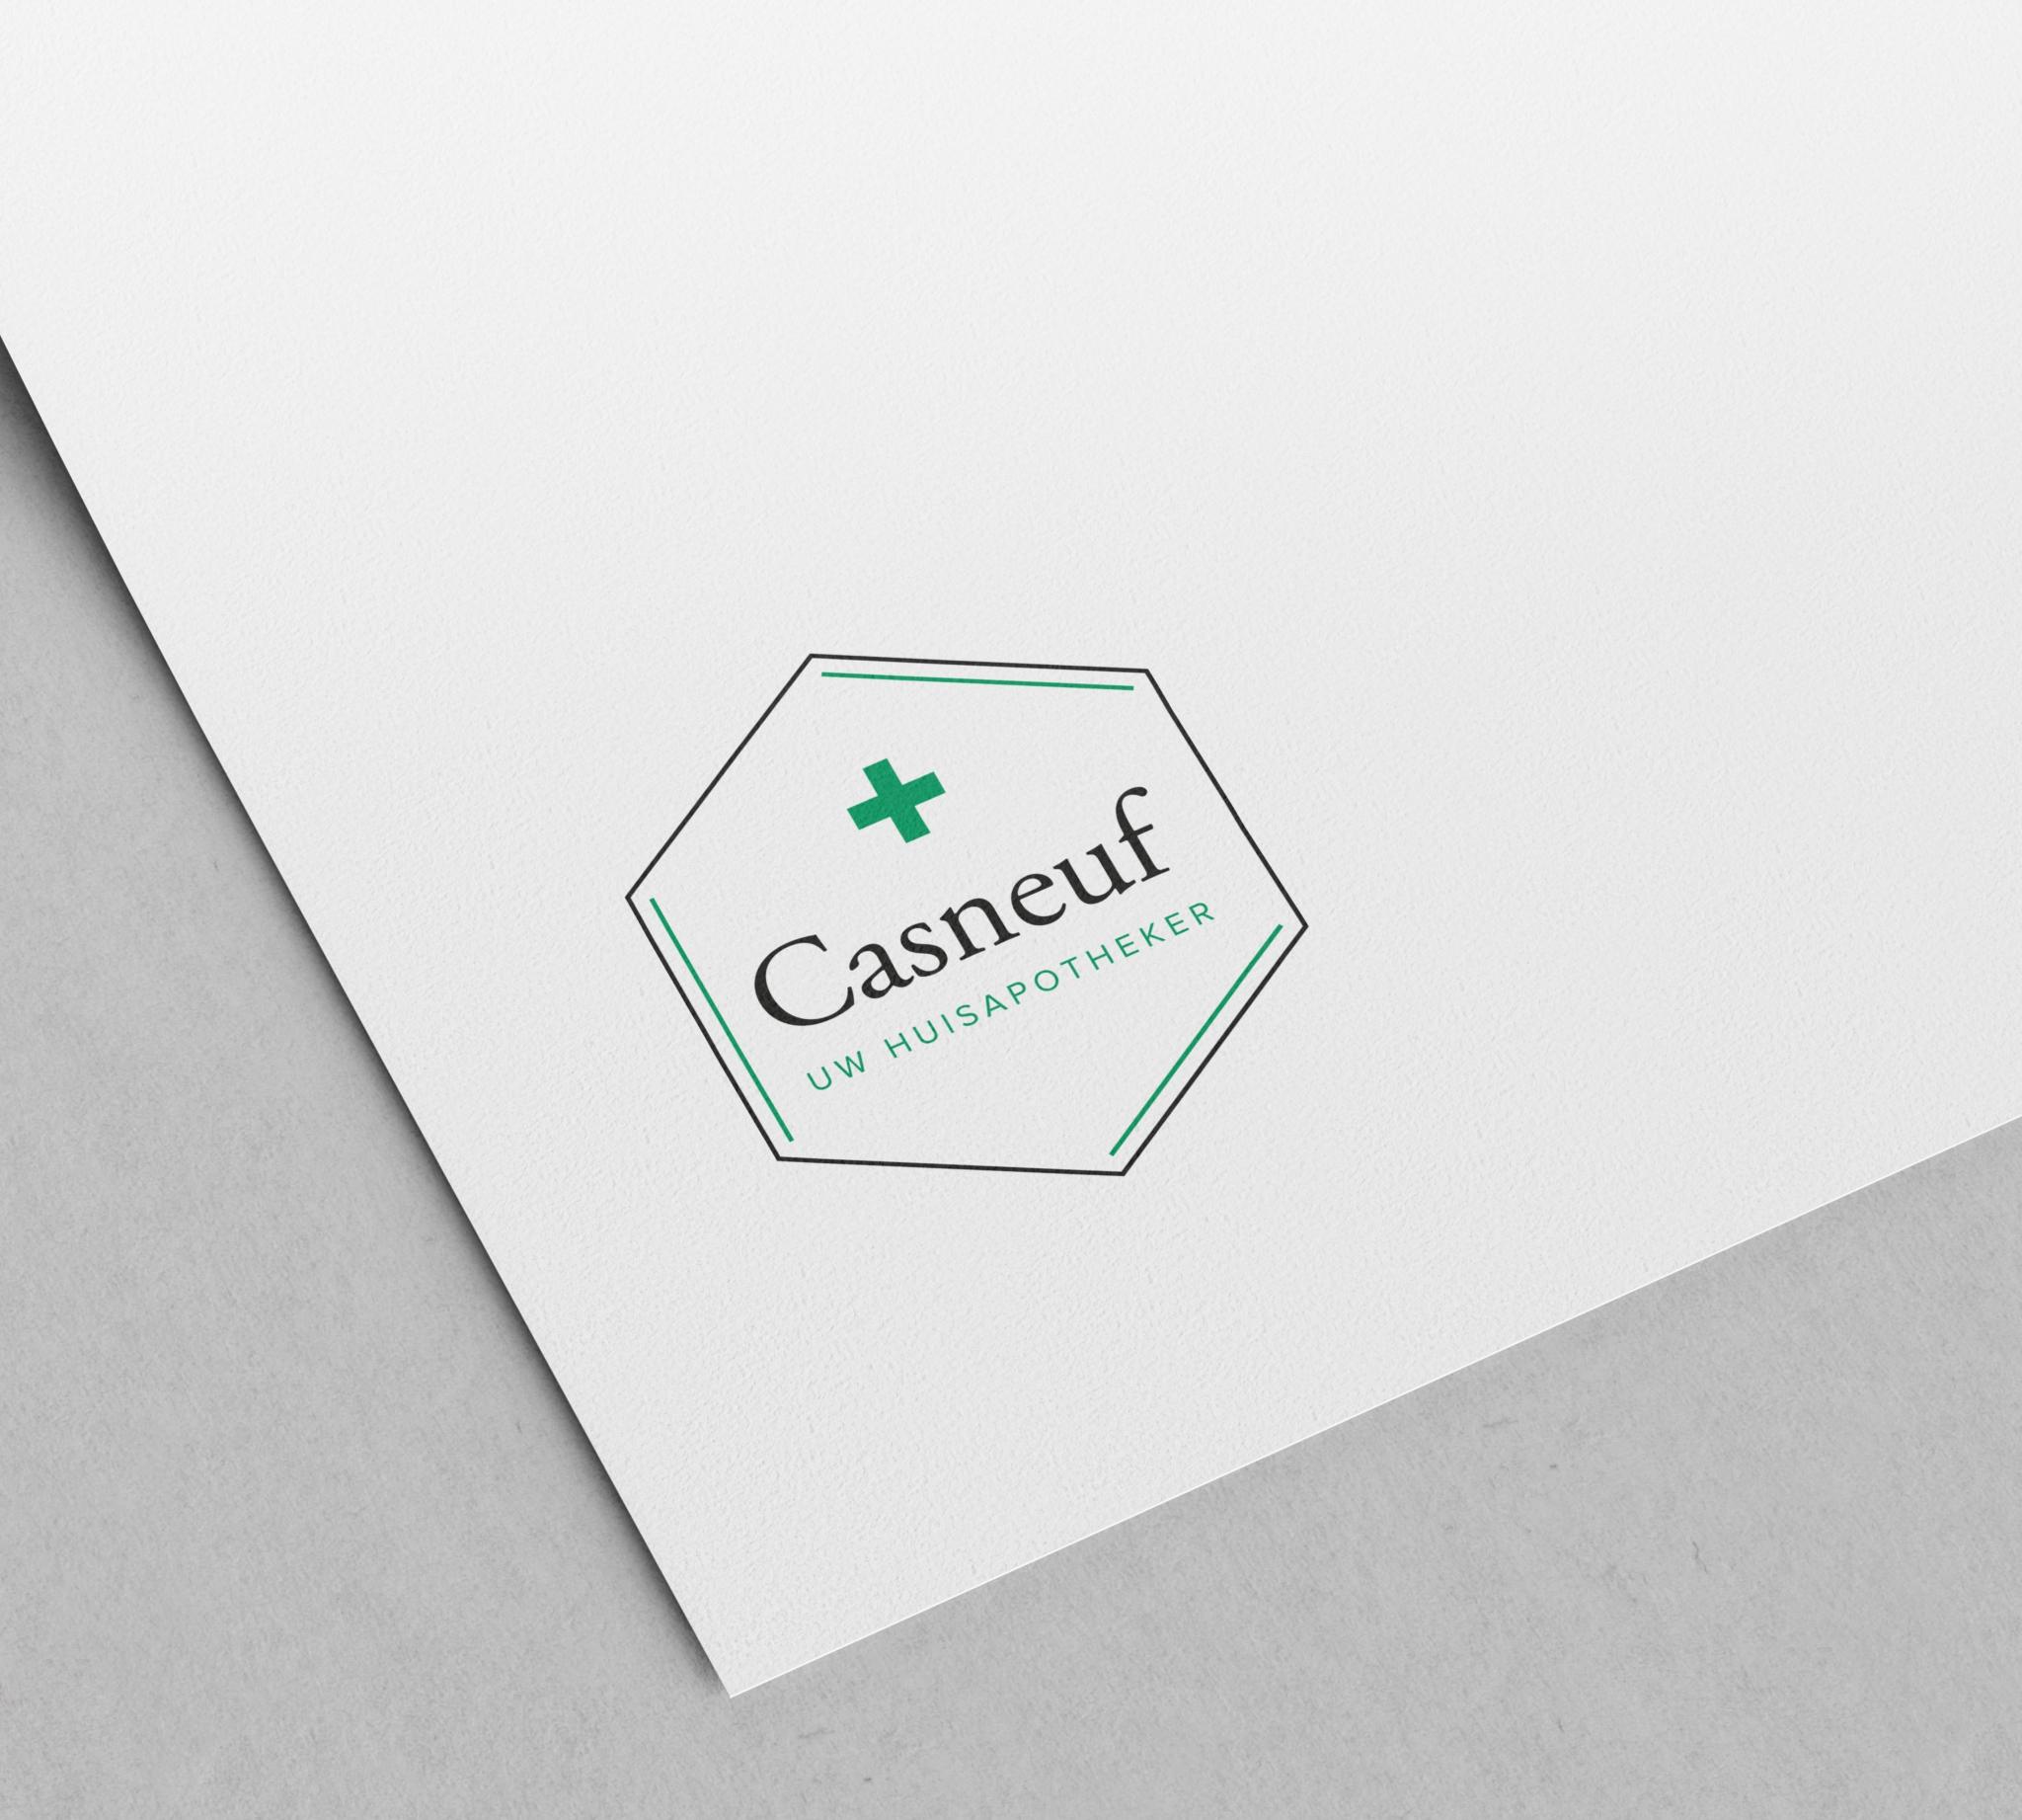 Print-Casneuf-Wizarts